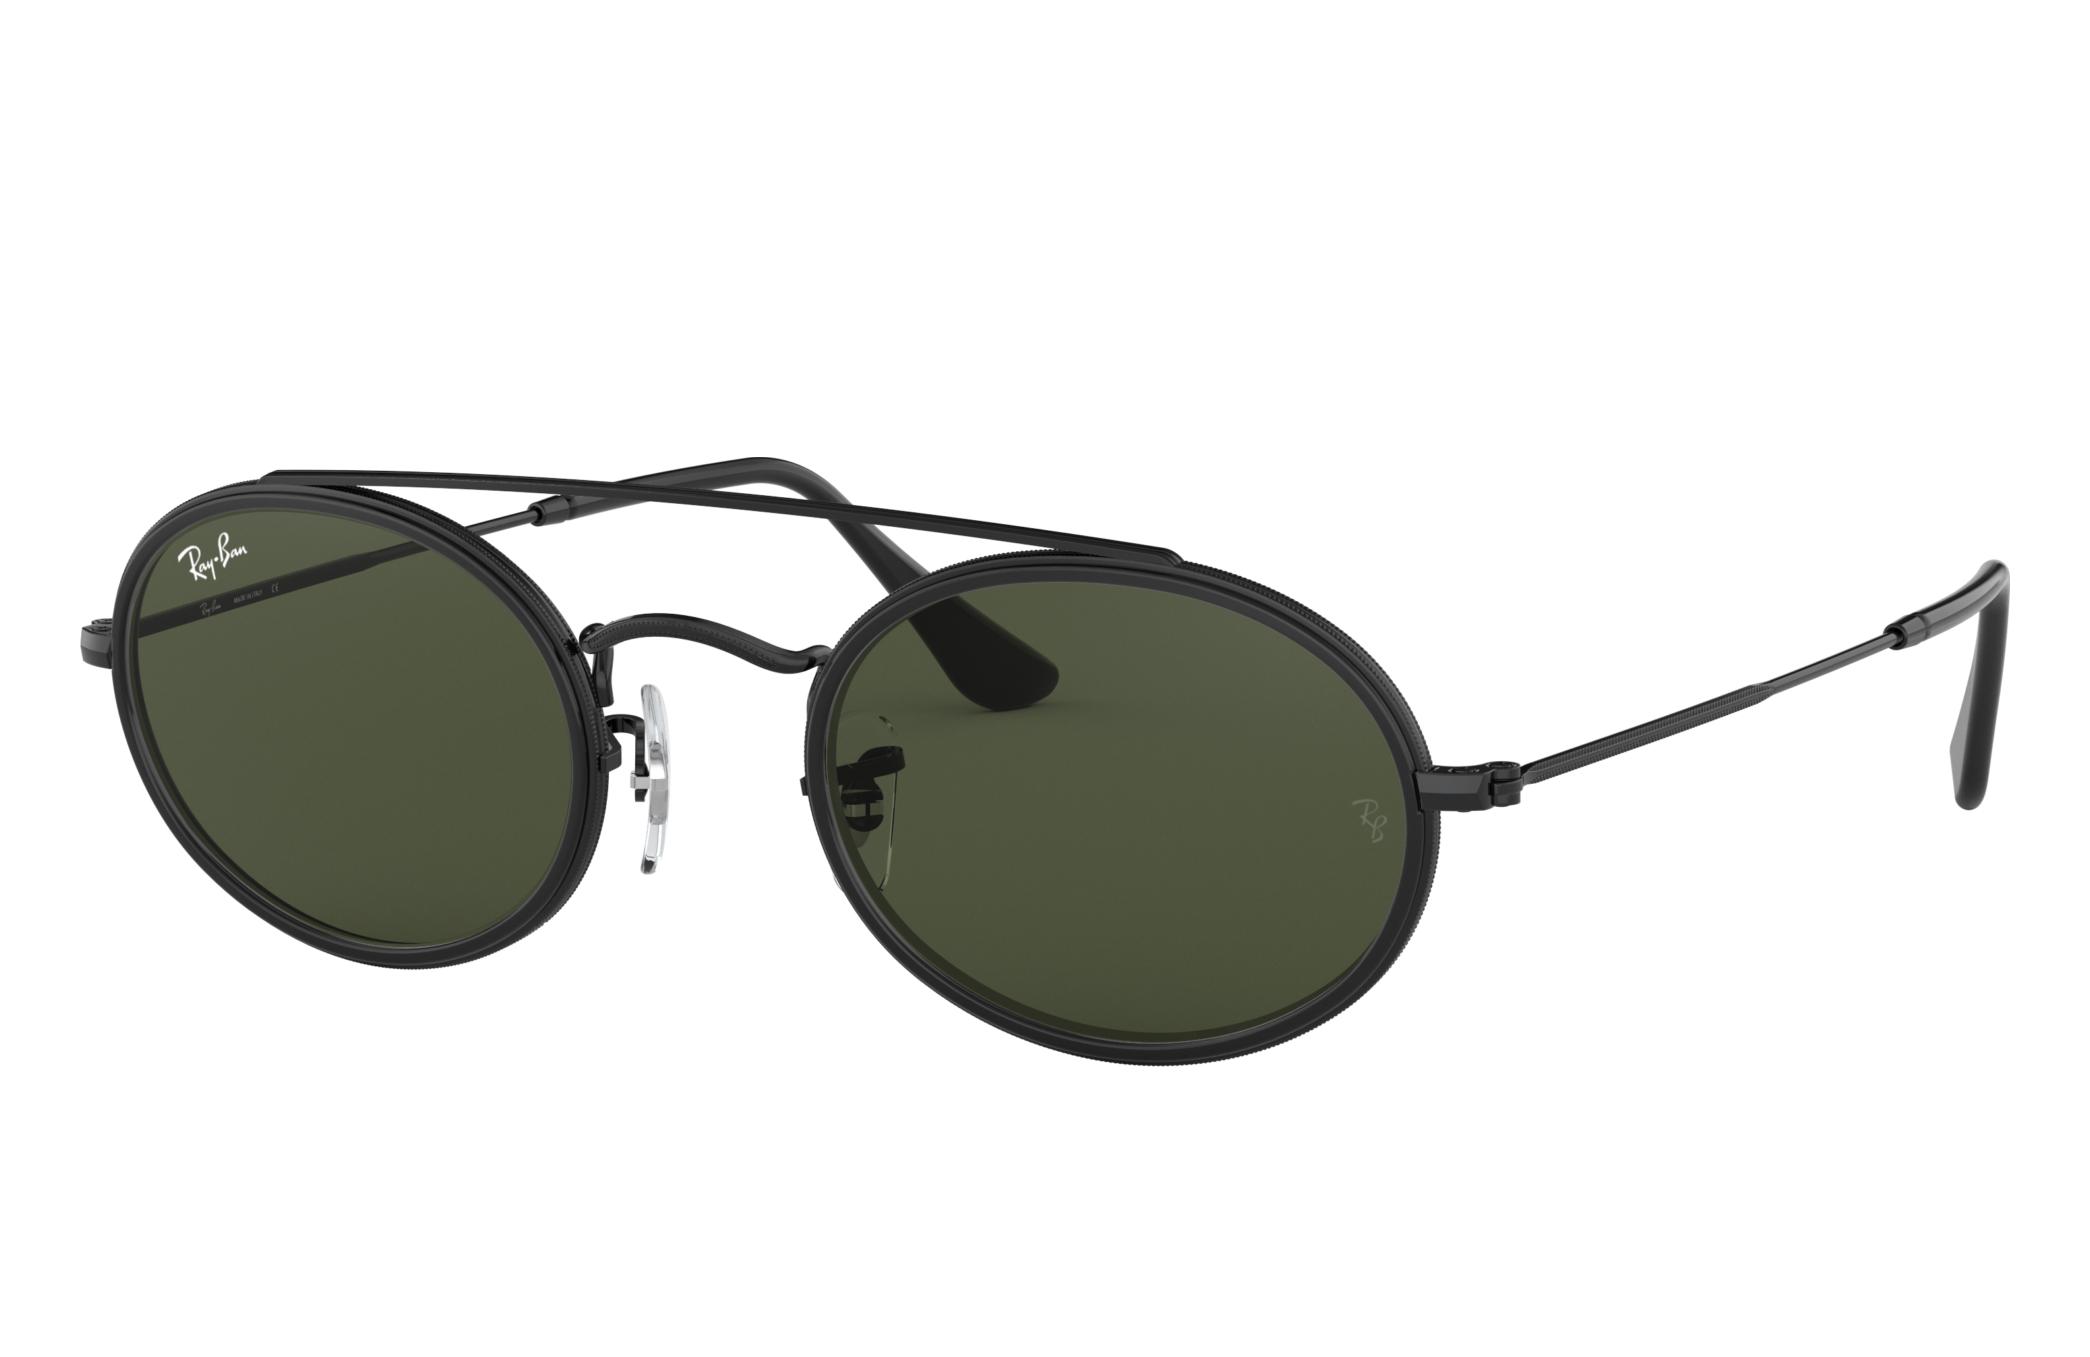 Ray-Ban Oval Double Bridge Black, Green Lenses - RB3847N